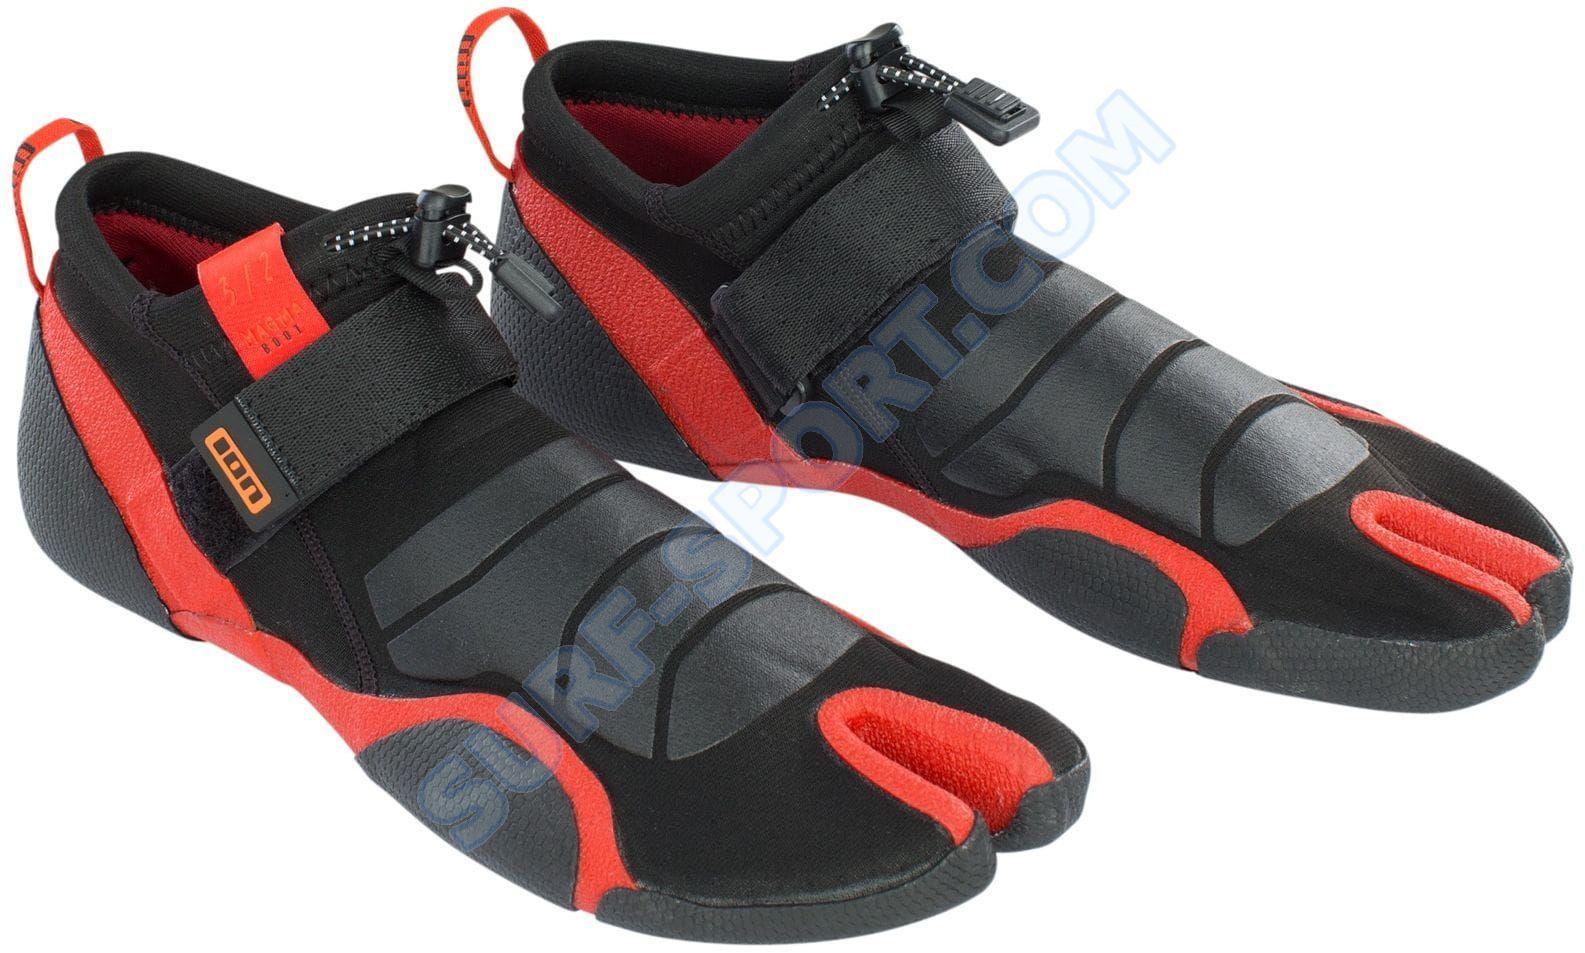 Buty Neoprenowe ION Magma Shoes 2.5 ES-2020